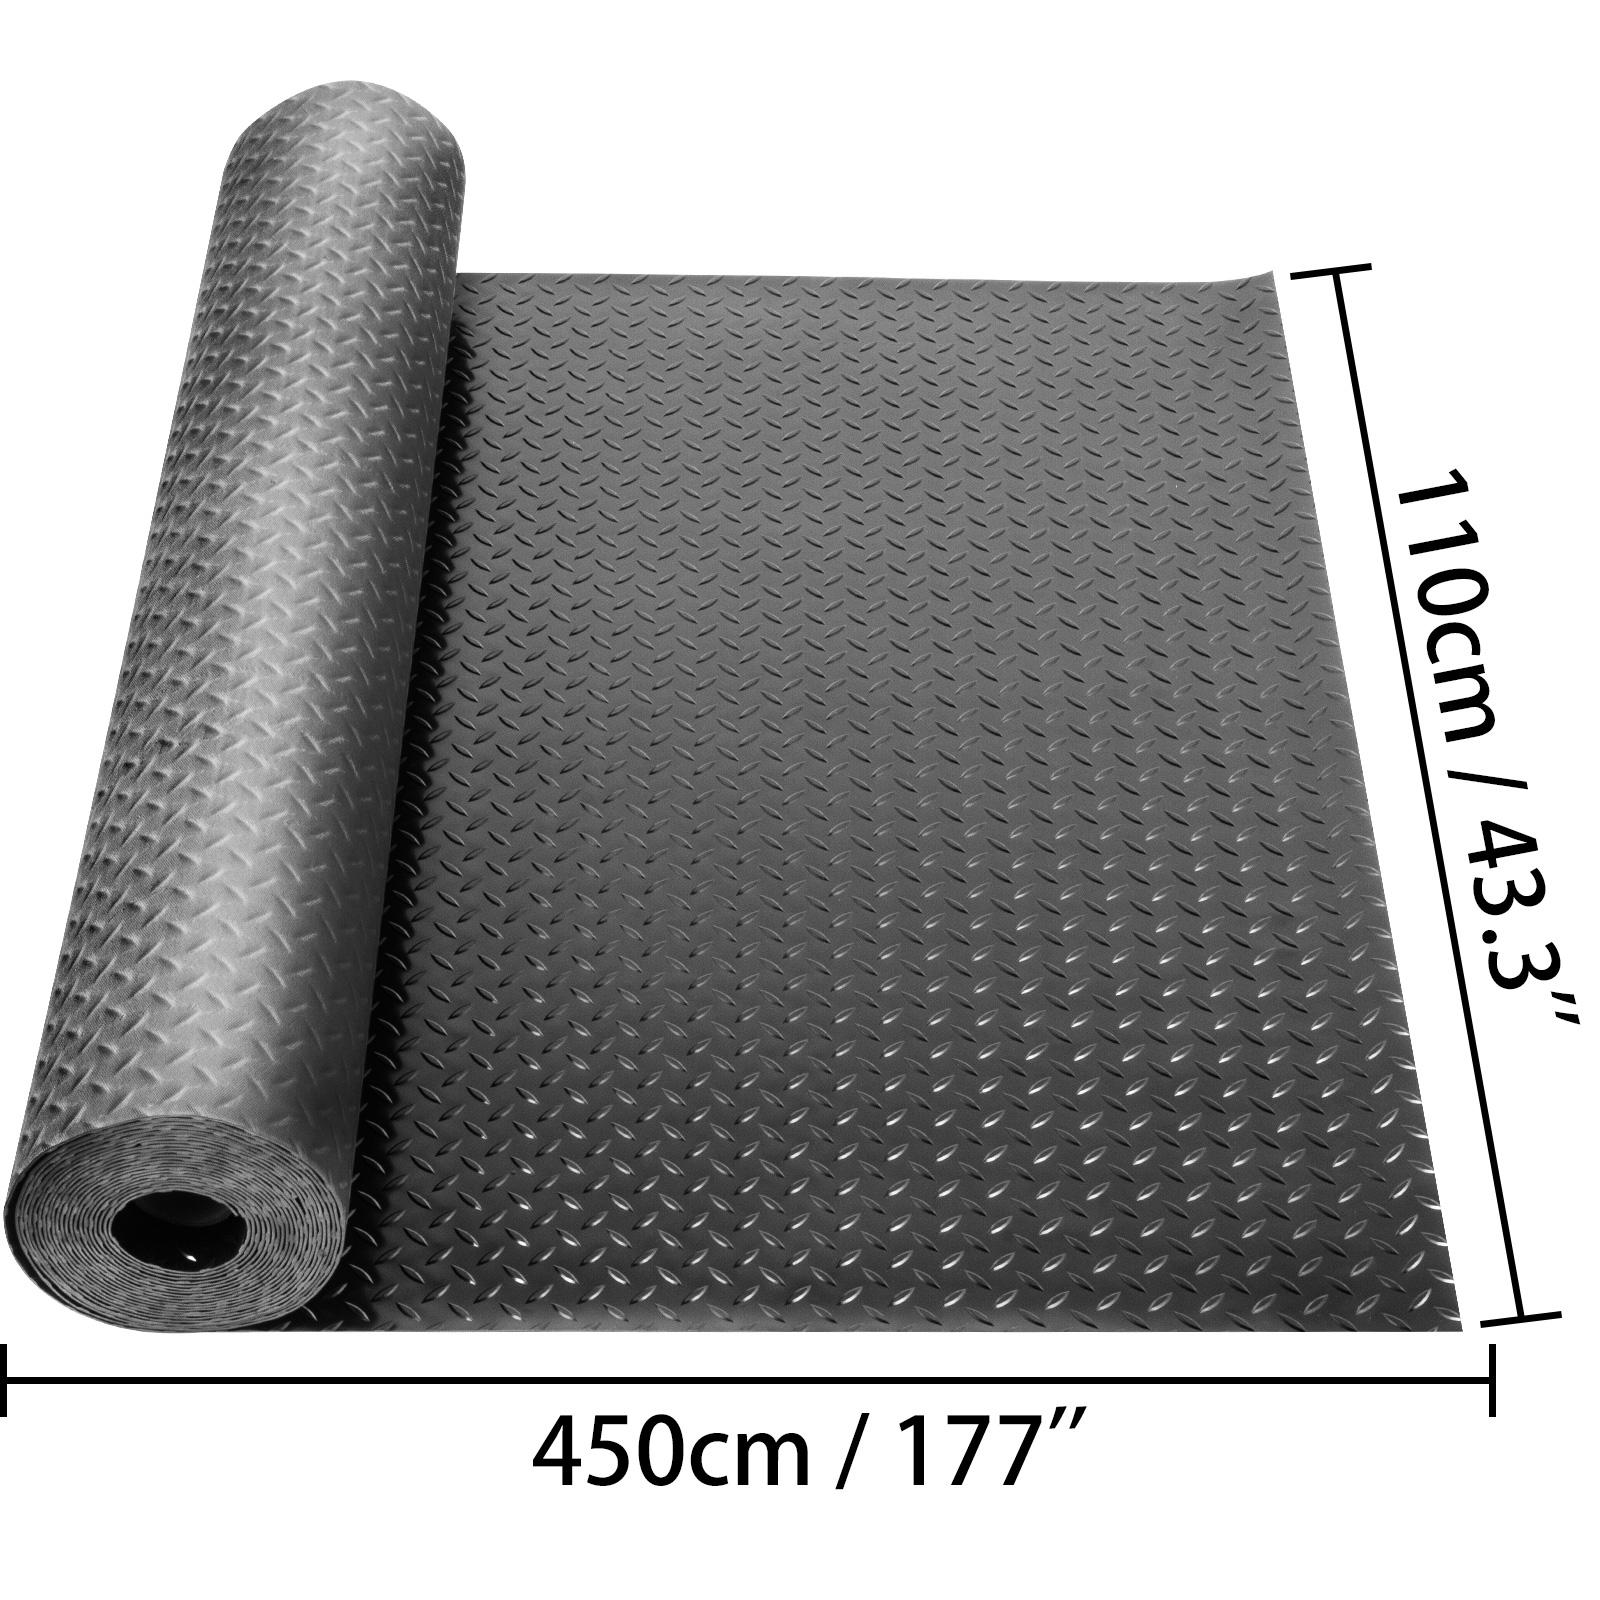 thumbnail 80 - Garage Flooring Mat Roll Car Trailer Floor Covering 1.1m Width Gym Floor Roll